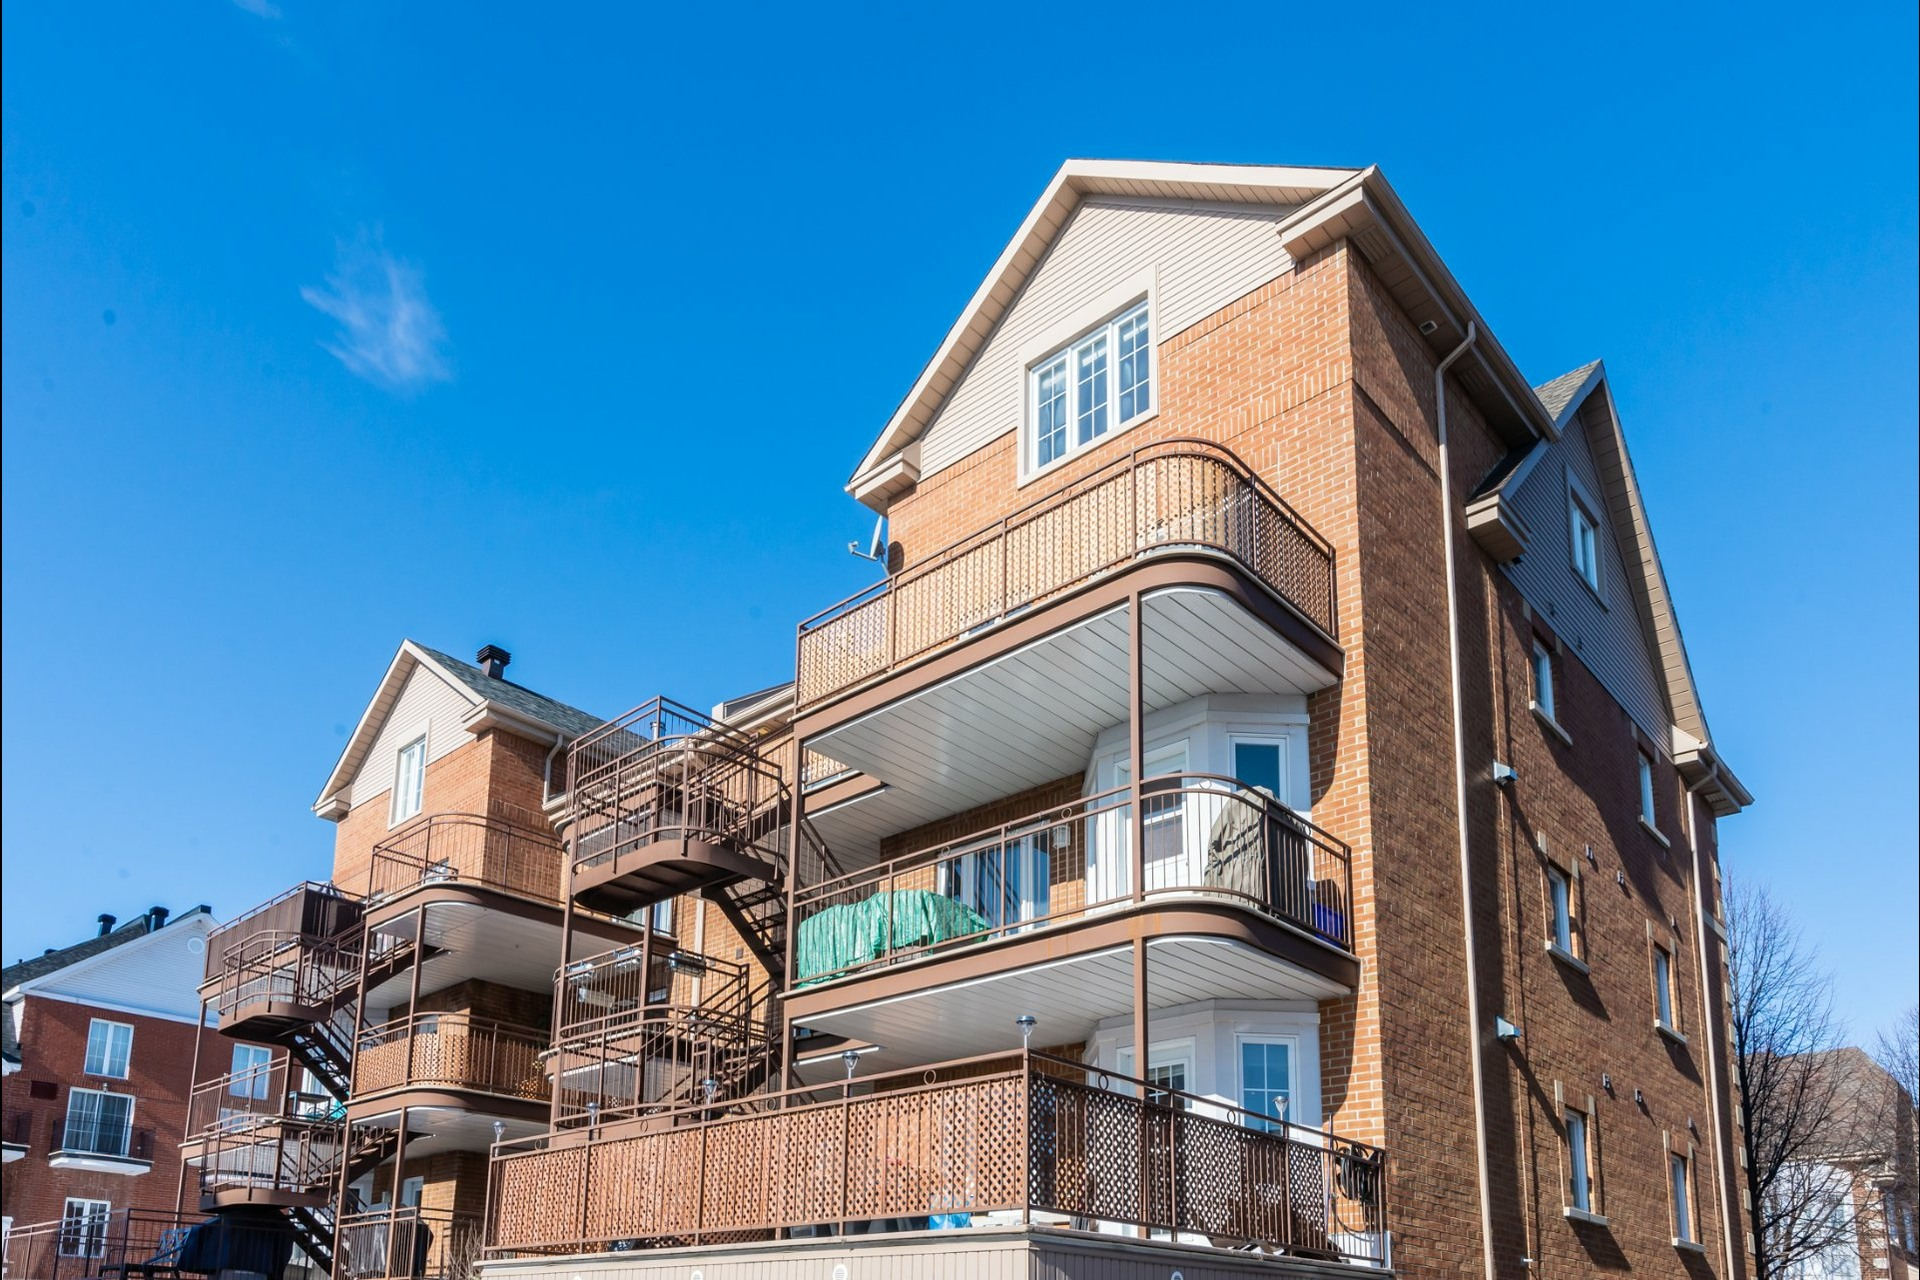 image 17 - Departamento En venta Saint-Laurent Montréal  - 4 habitaciones